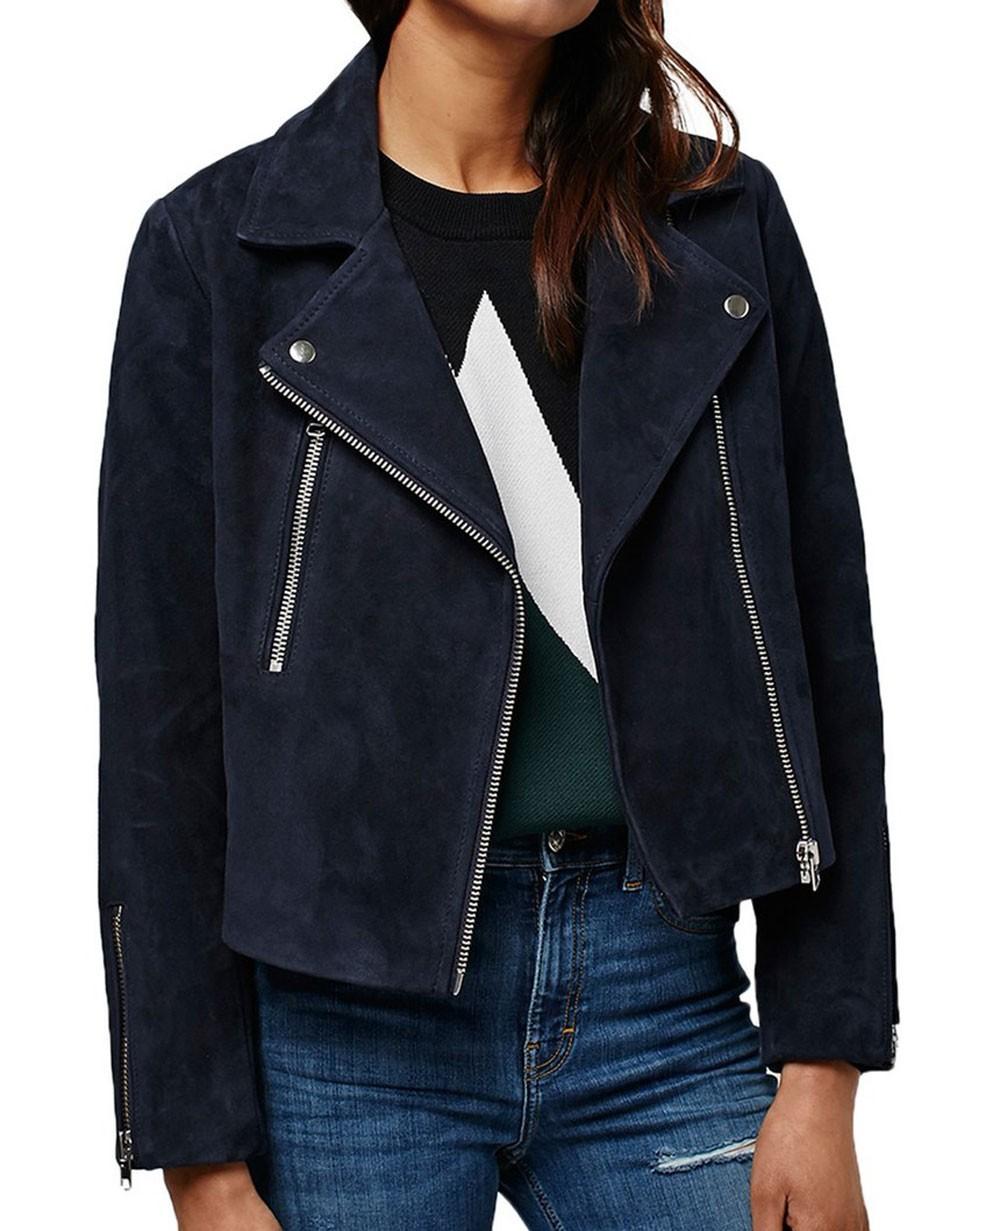 Navy Blue Suede Women Moto Leather Jackets